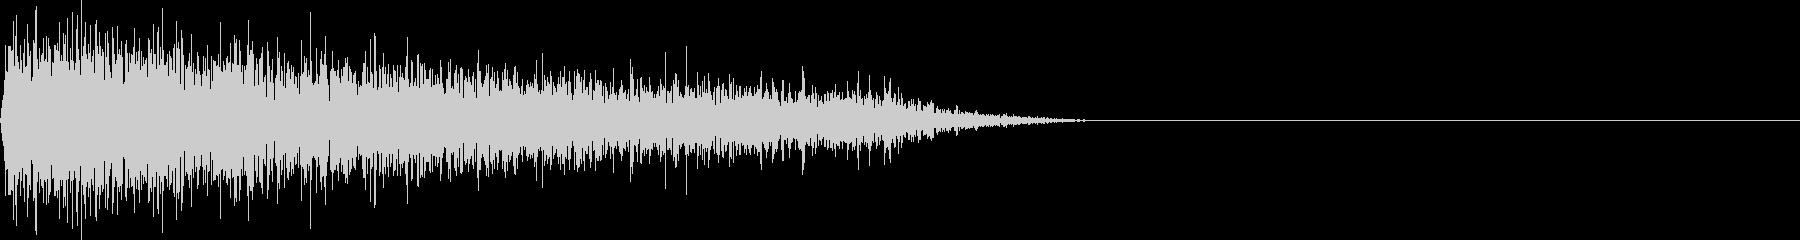 FX・SEピアノ/ショック/衝撃/2-Aの未再生の波形